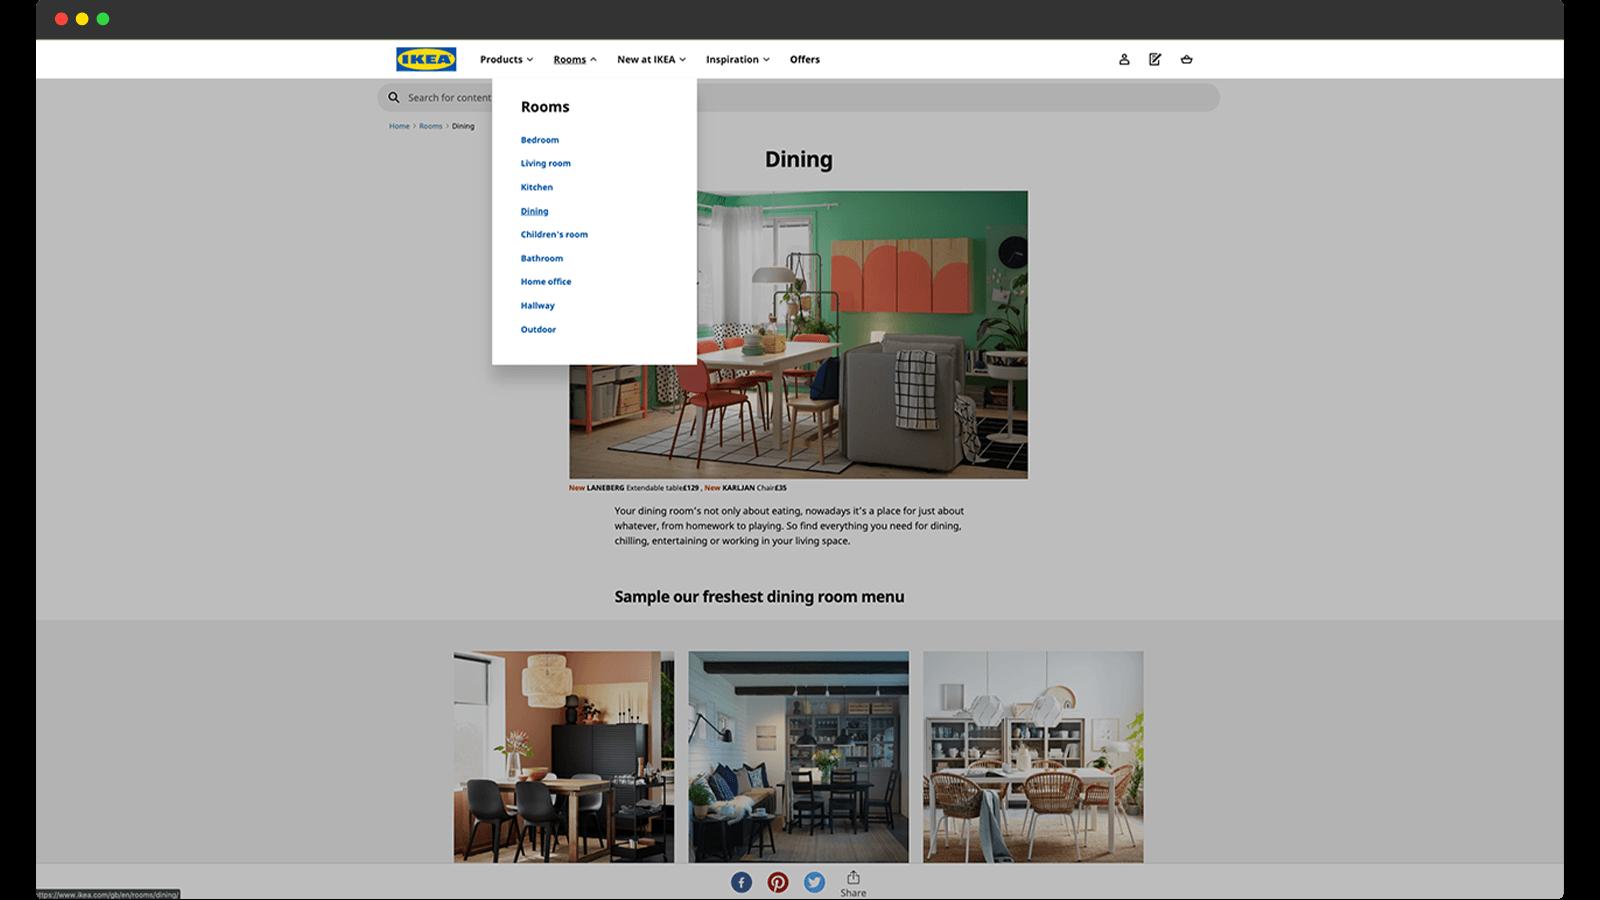 IKEA online store navigation